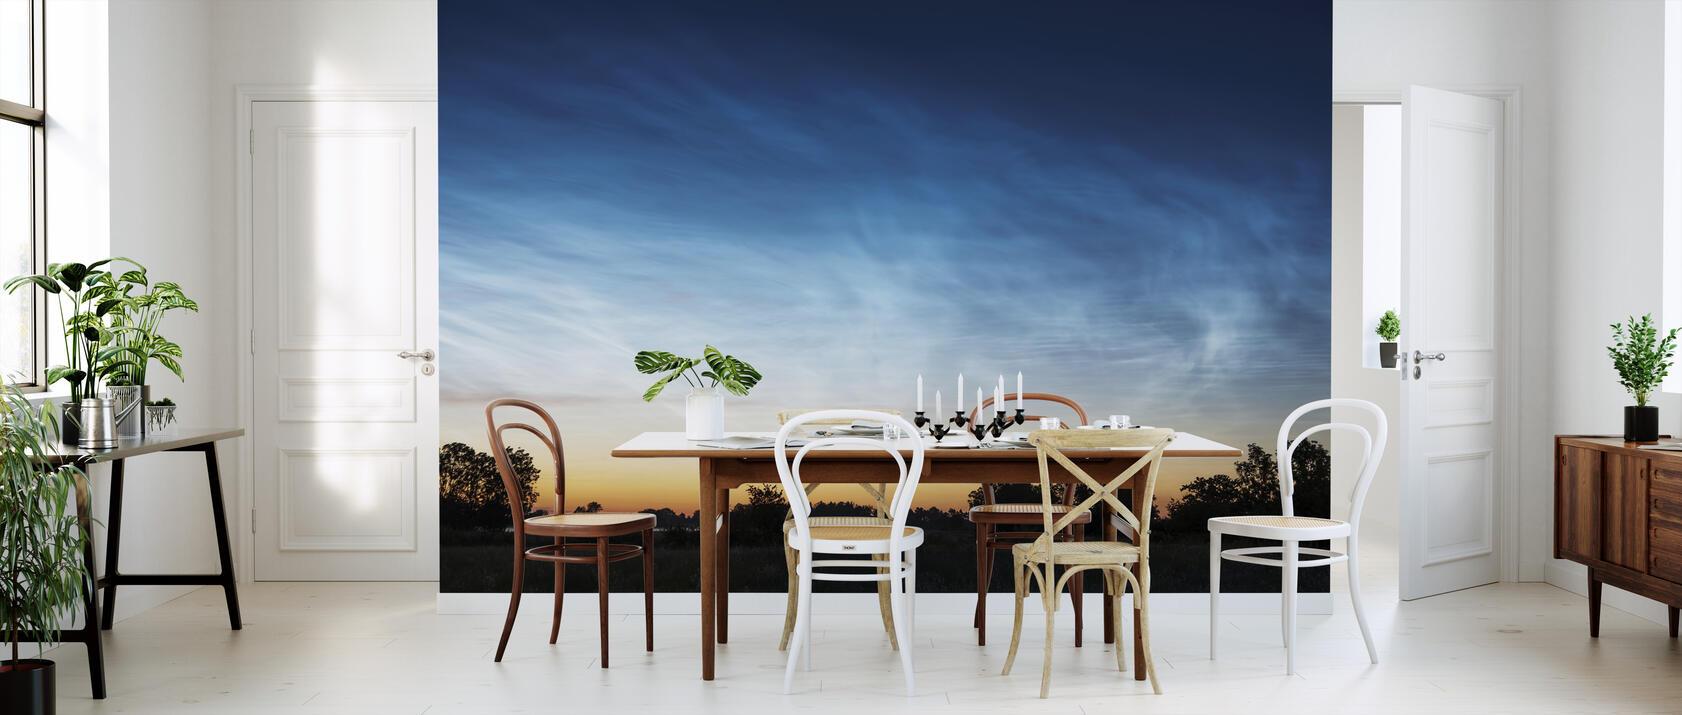 gotland nightfall fototapete nach ma photowall. Black Bedroom Furniture Sets. Home Design Ideas